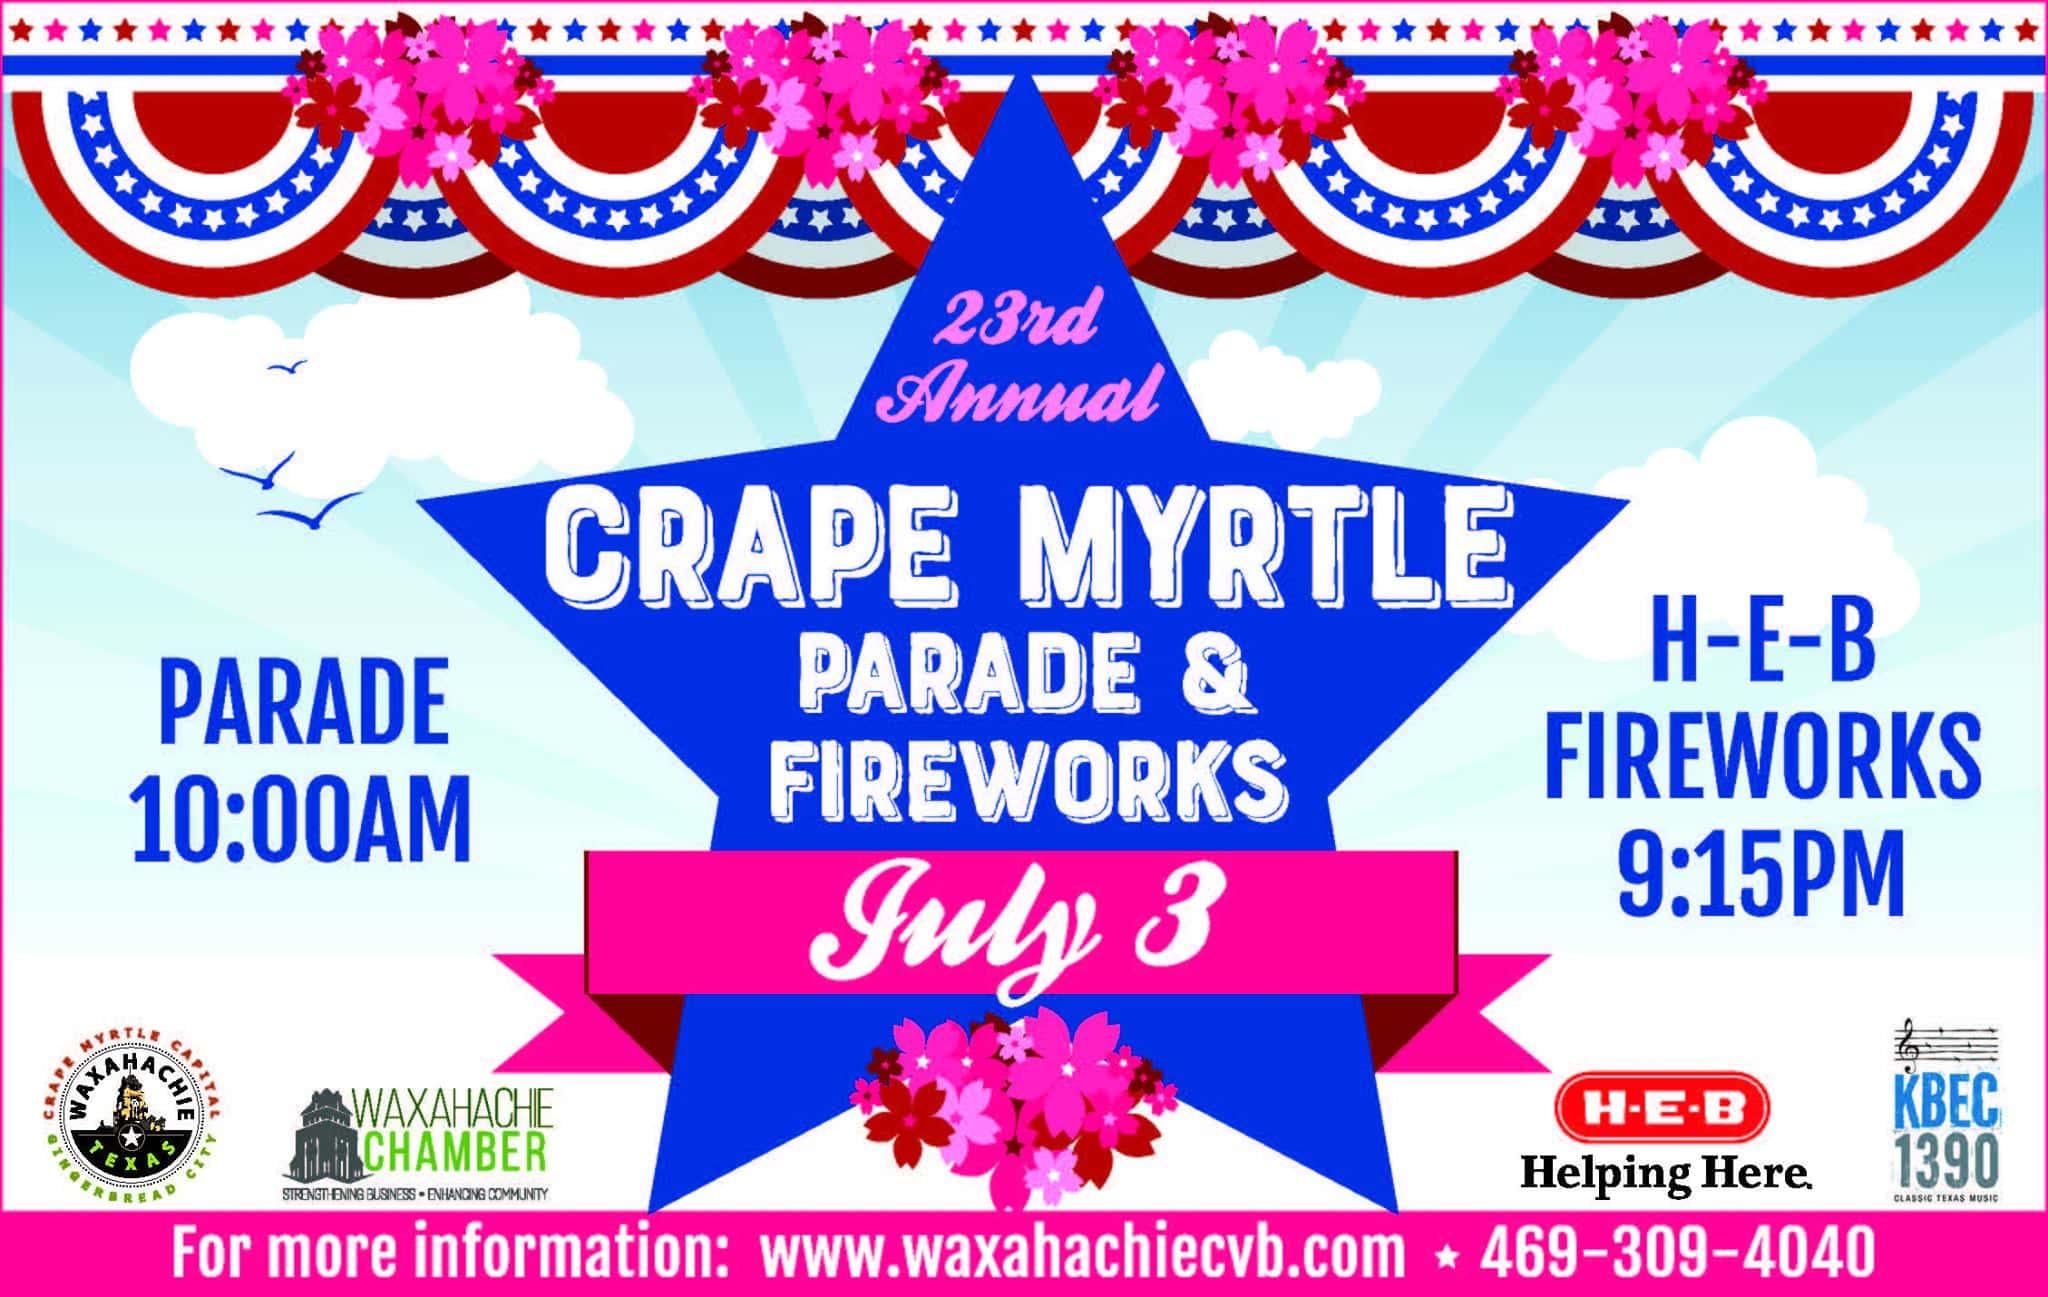 Crape Myrtle Parade poster